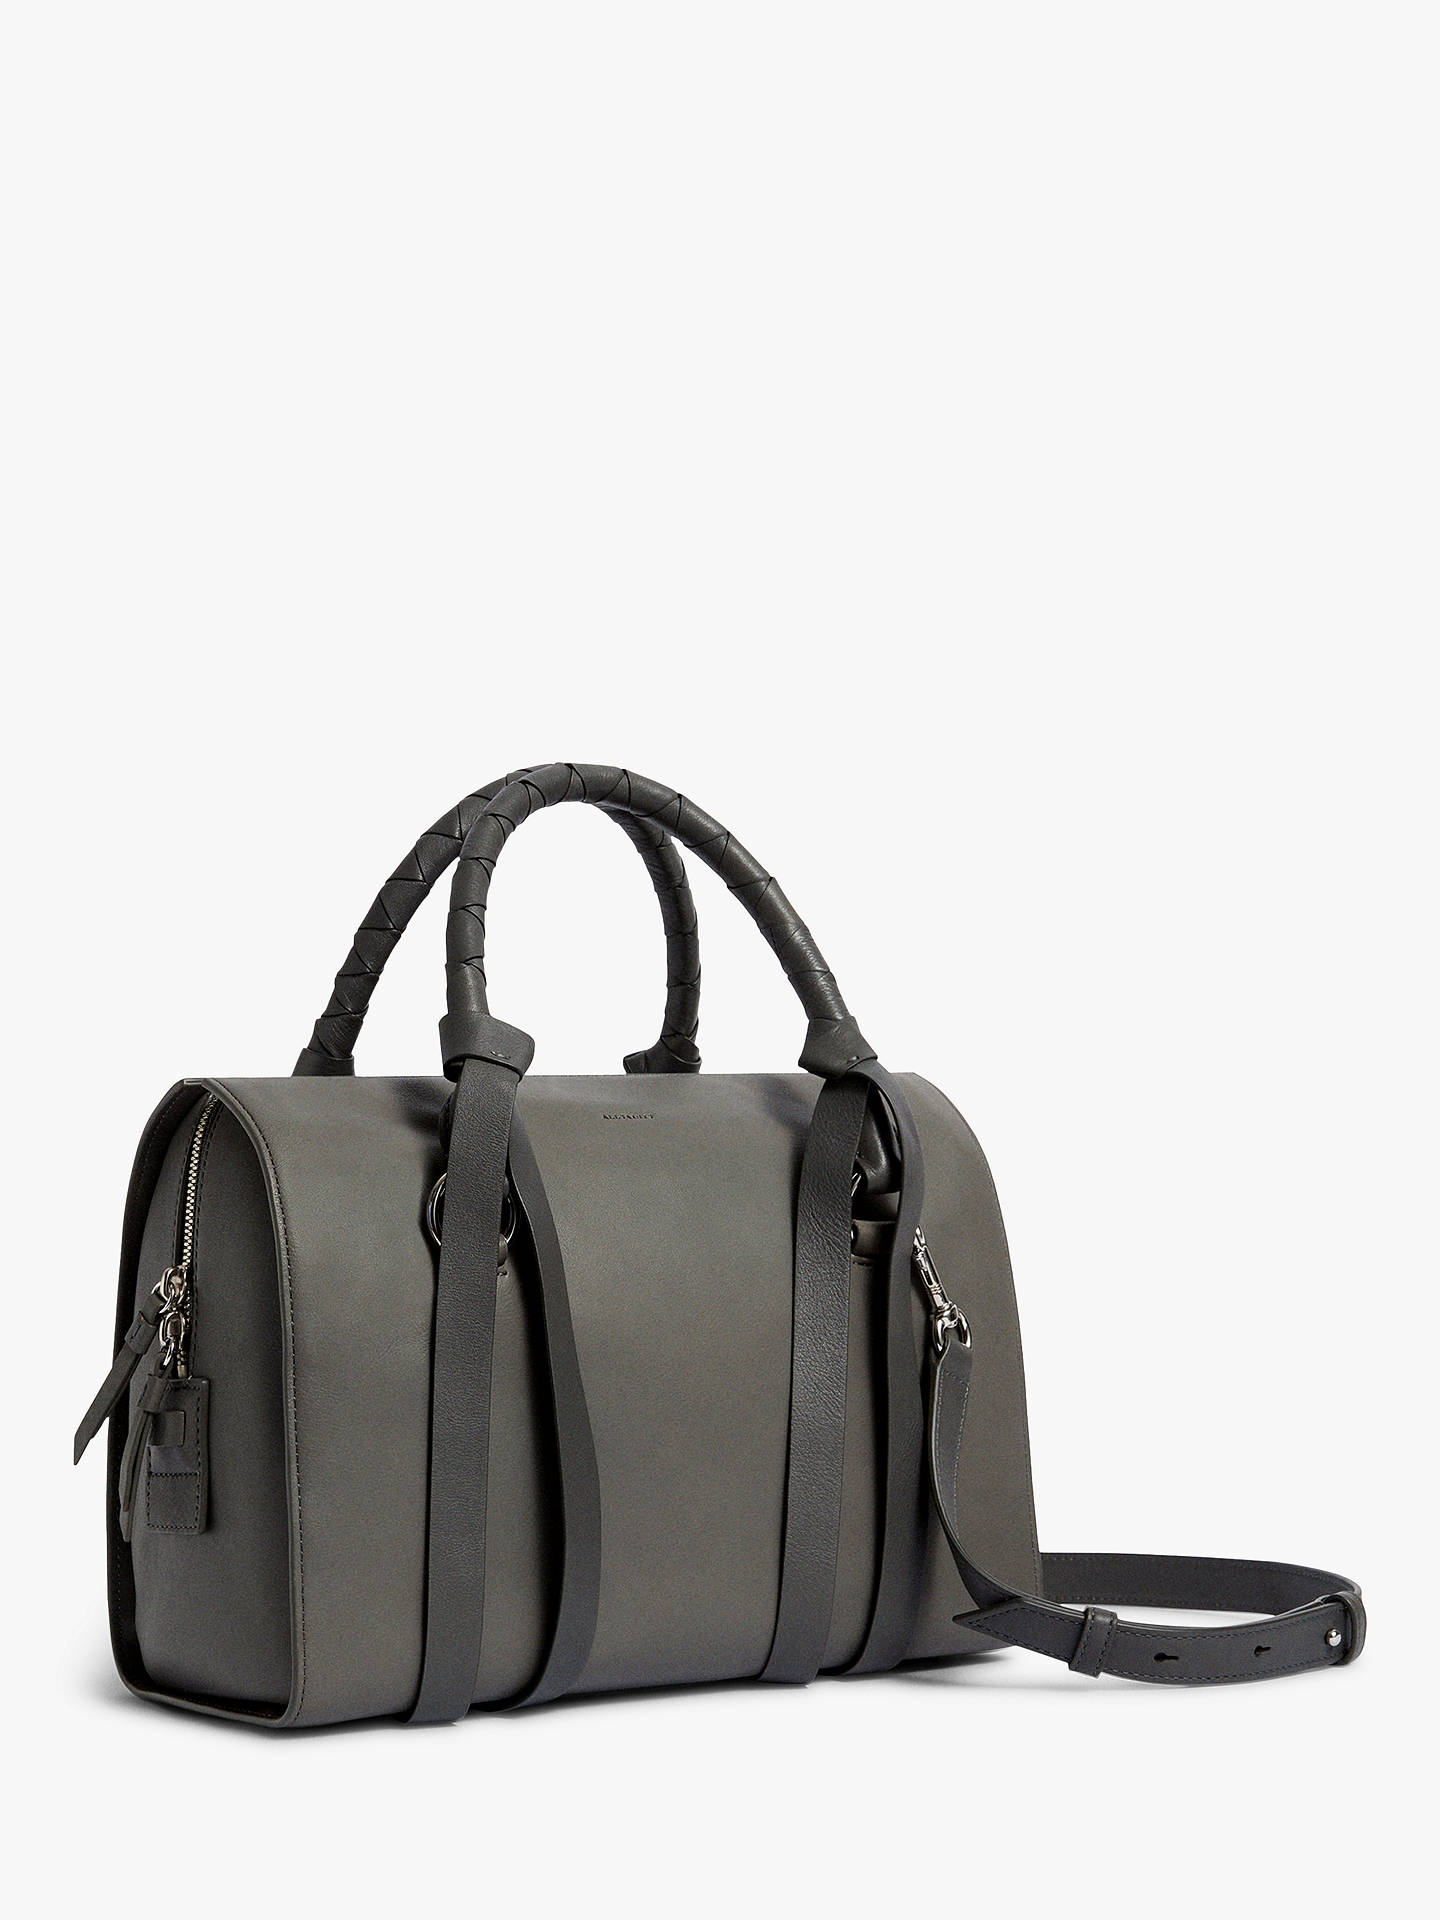 9902dceccf49 ... BuyAllSaints Voltaire Leather Bowling Bag